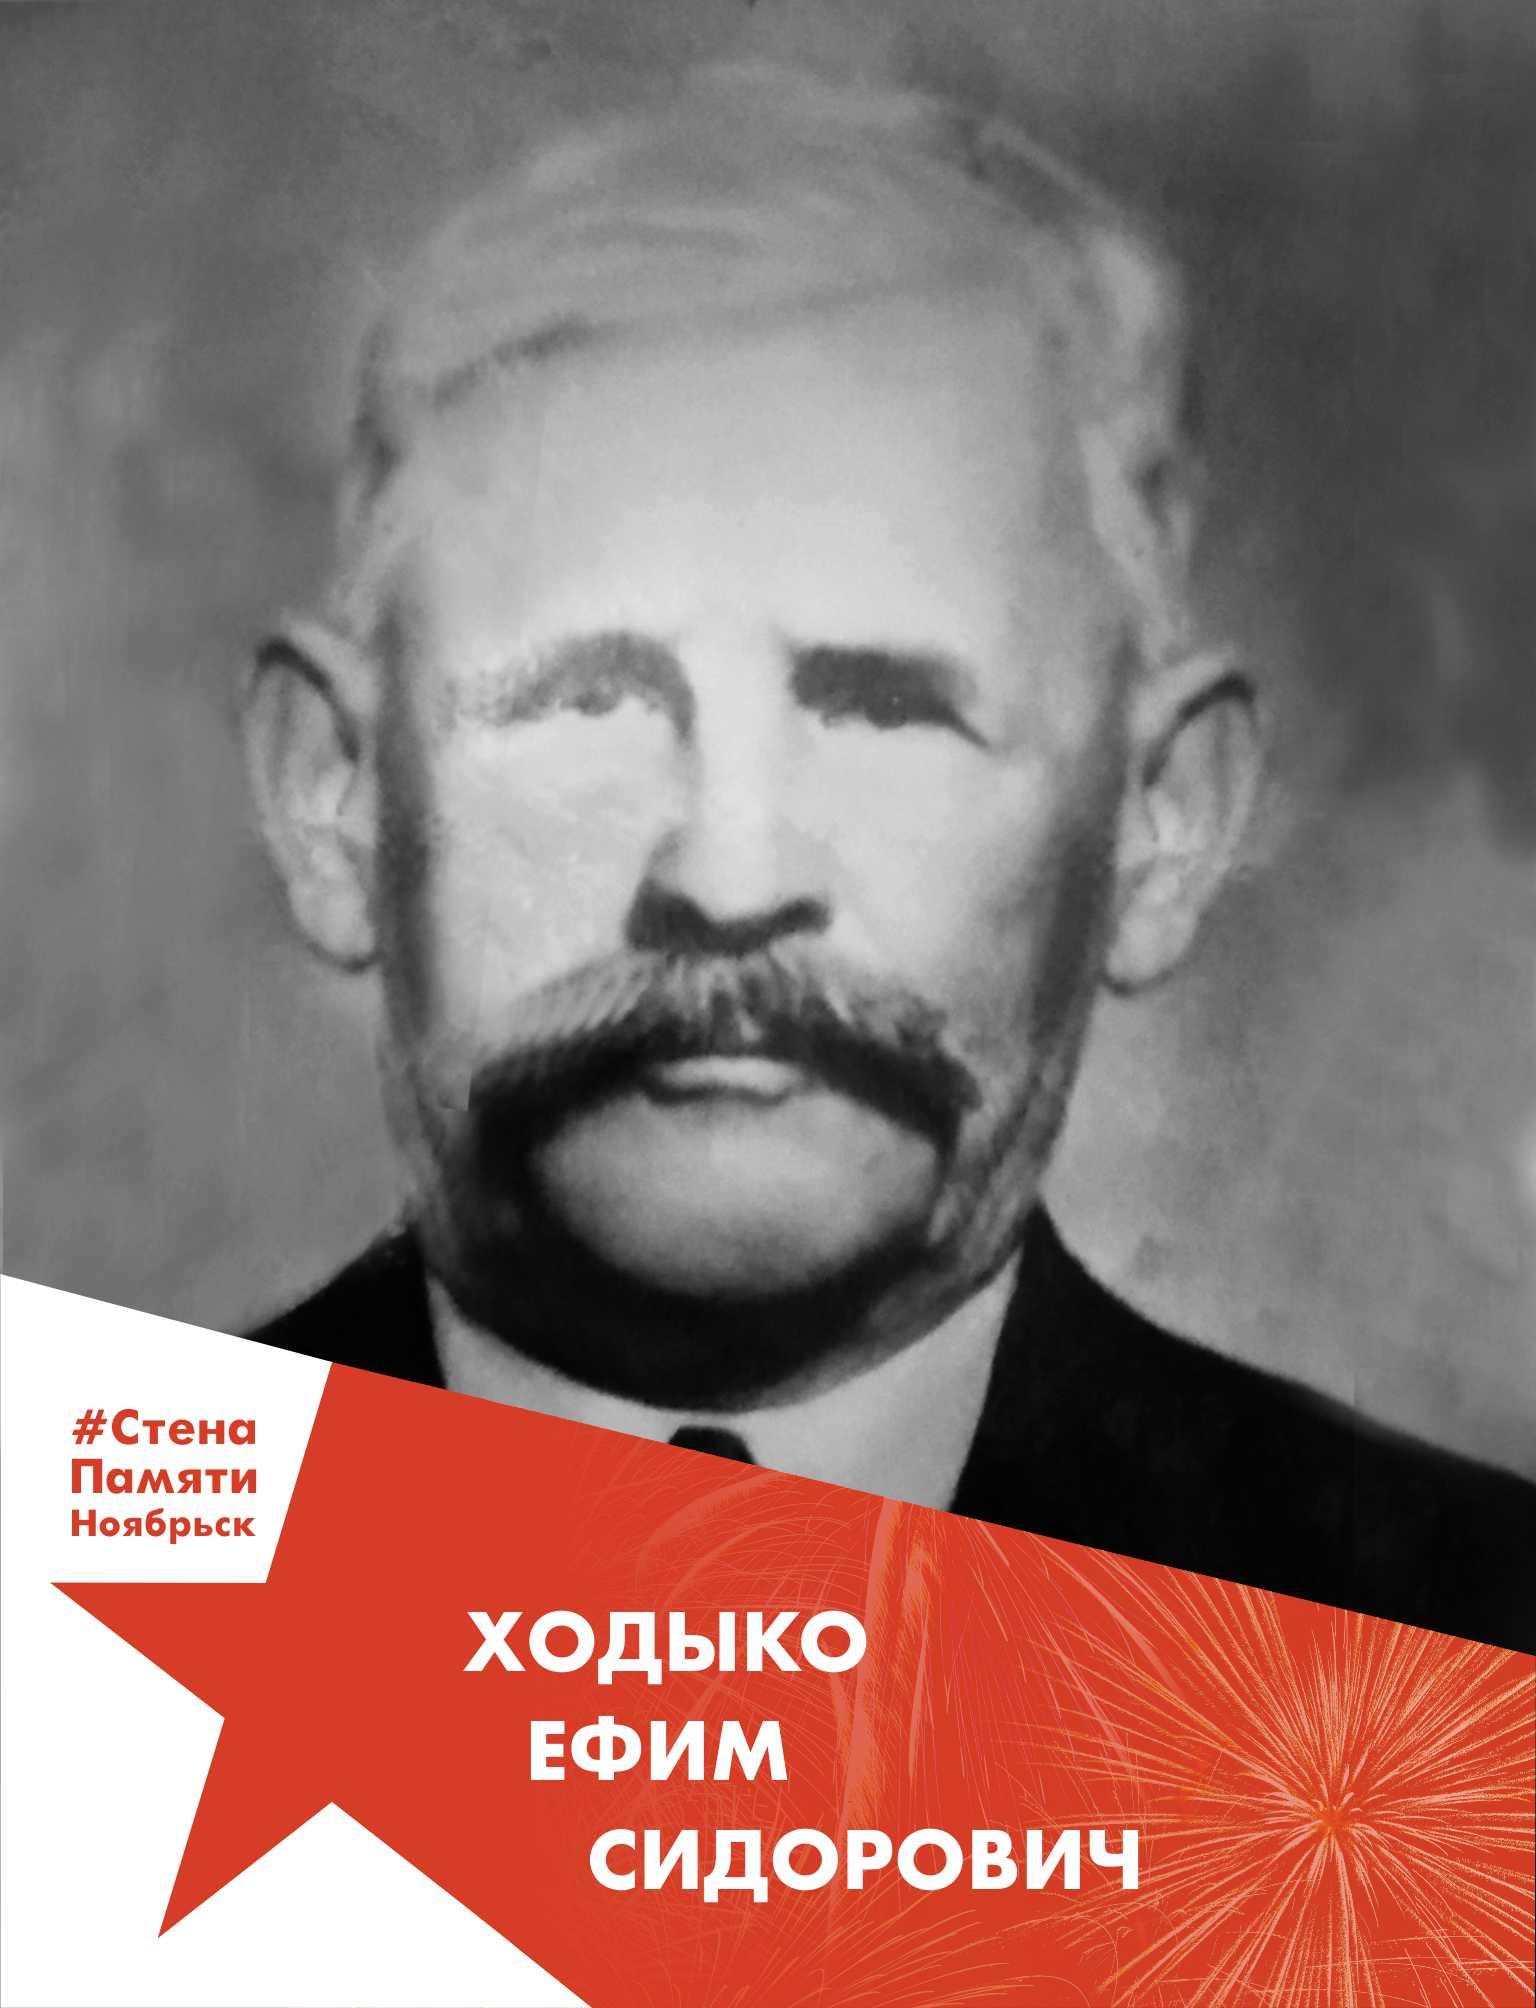 Ходыко Ефим Сидорович